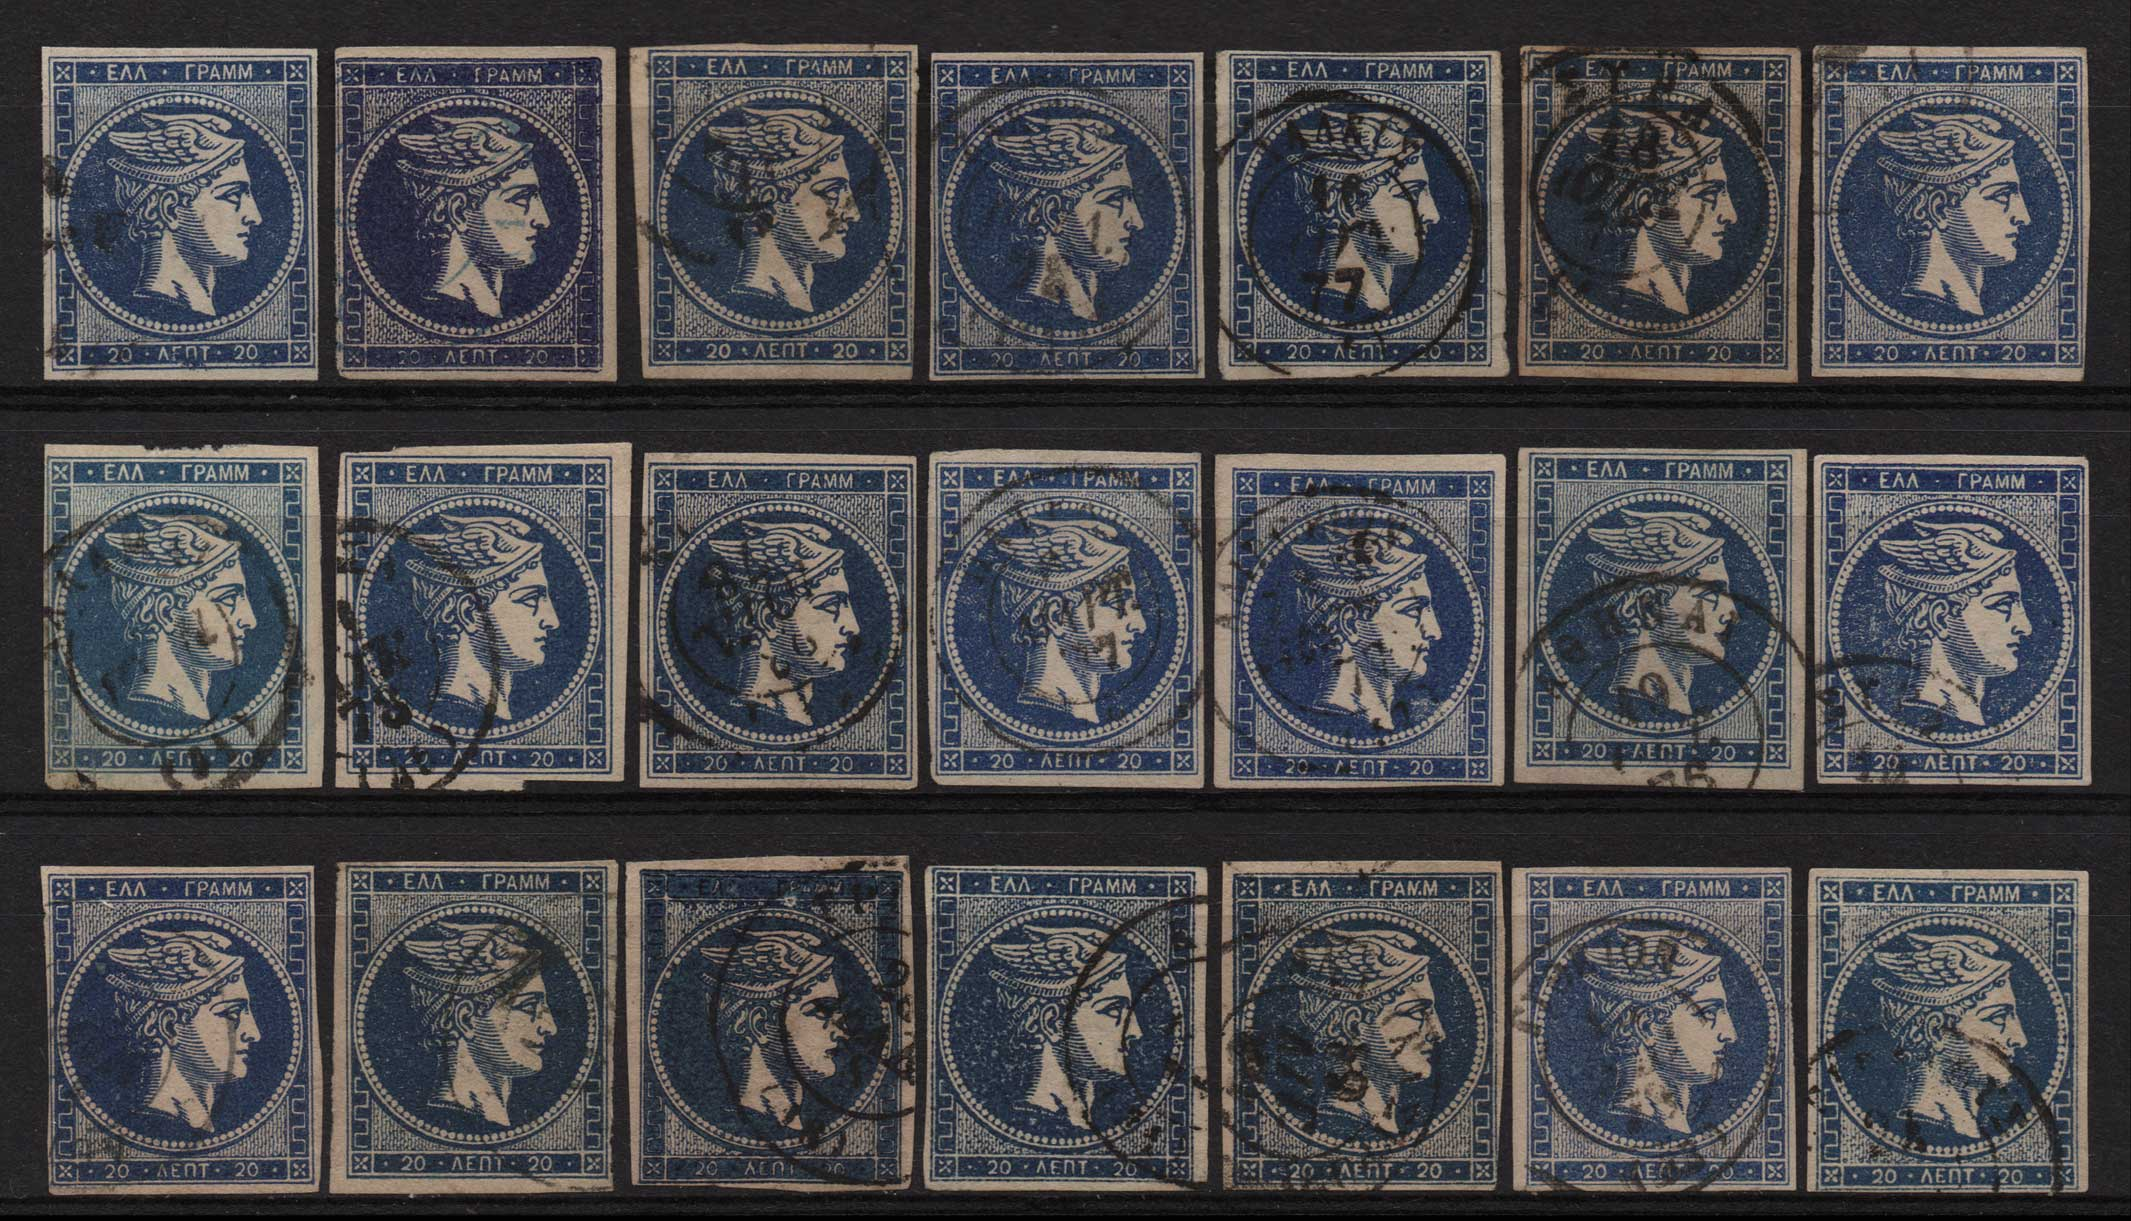 Lot 16 - GREECE-  LARGE HERMES HEAD large hermes head -  Athens Auctions Public Auction 63 General Stamp Sale